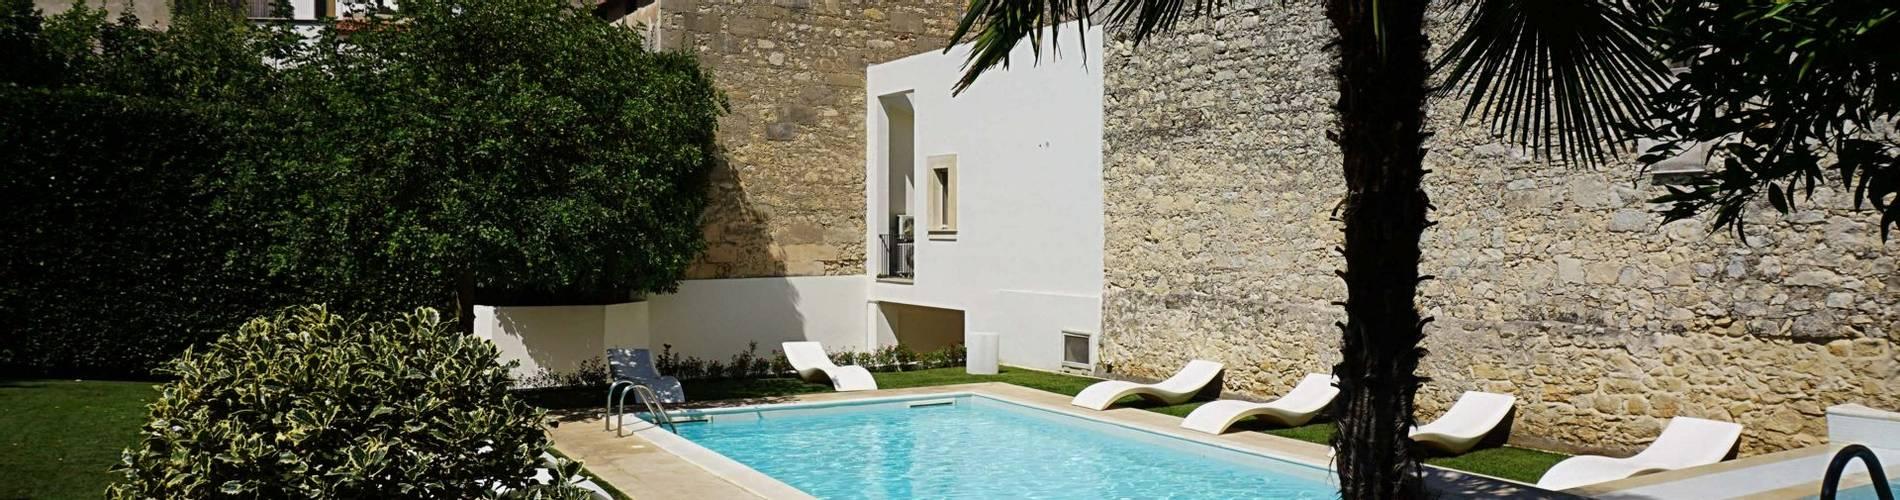 Villa Del Lauro, Sicily, Italy.jpg